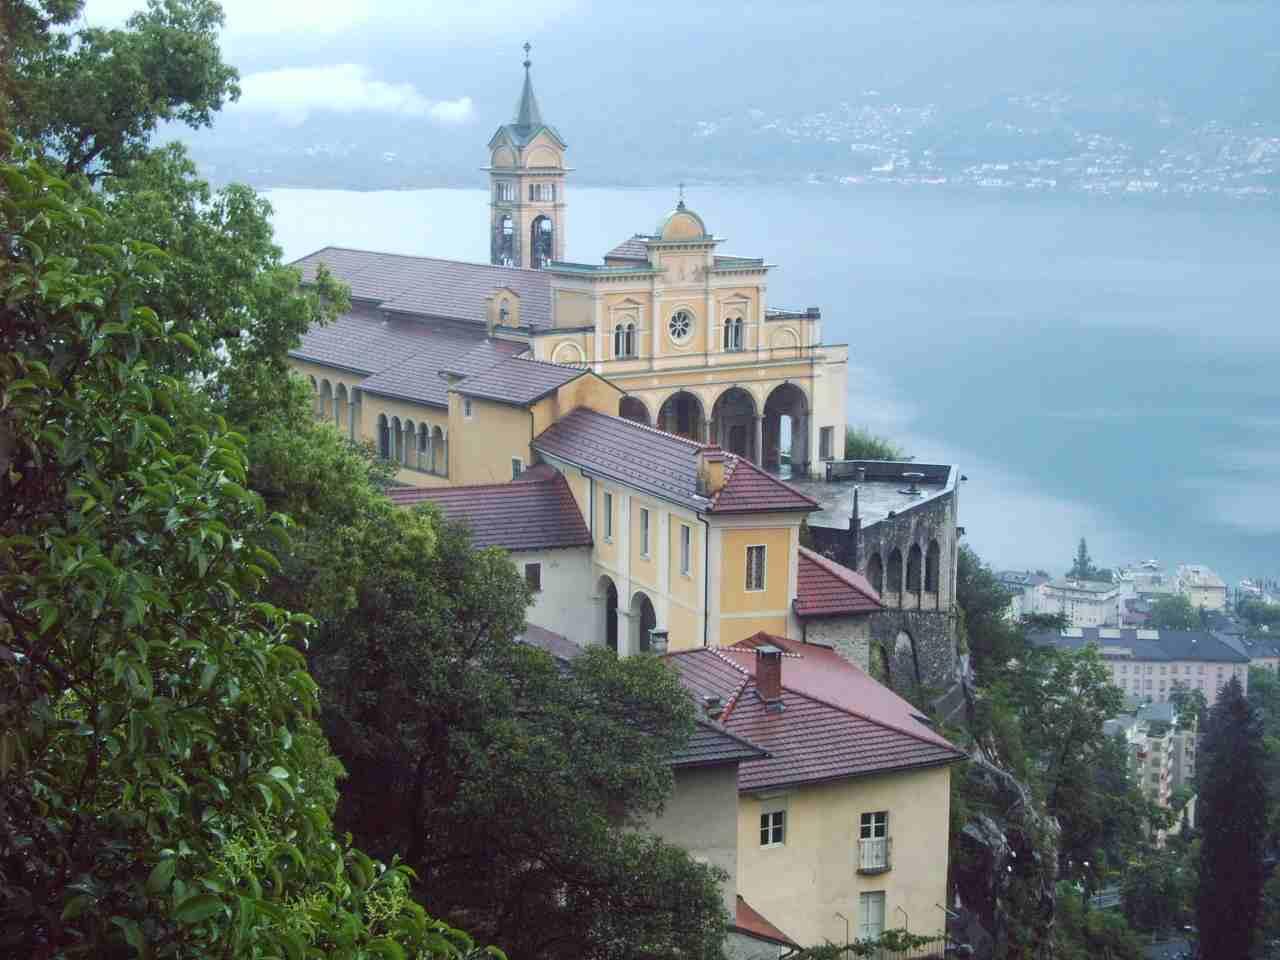 Madonna del sasso - Marien-Walfahrtsort bei Locarno